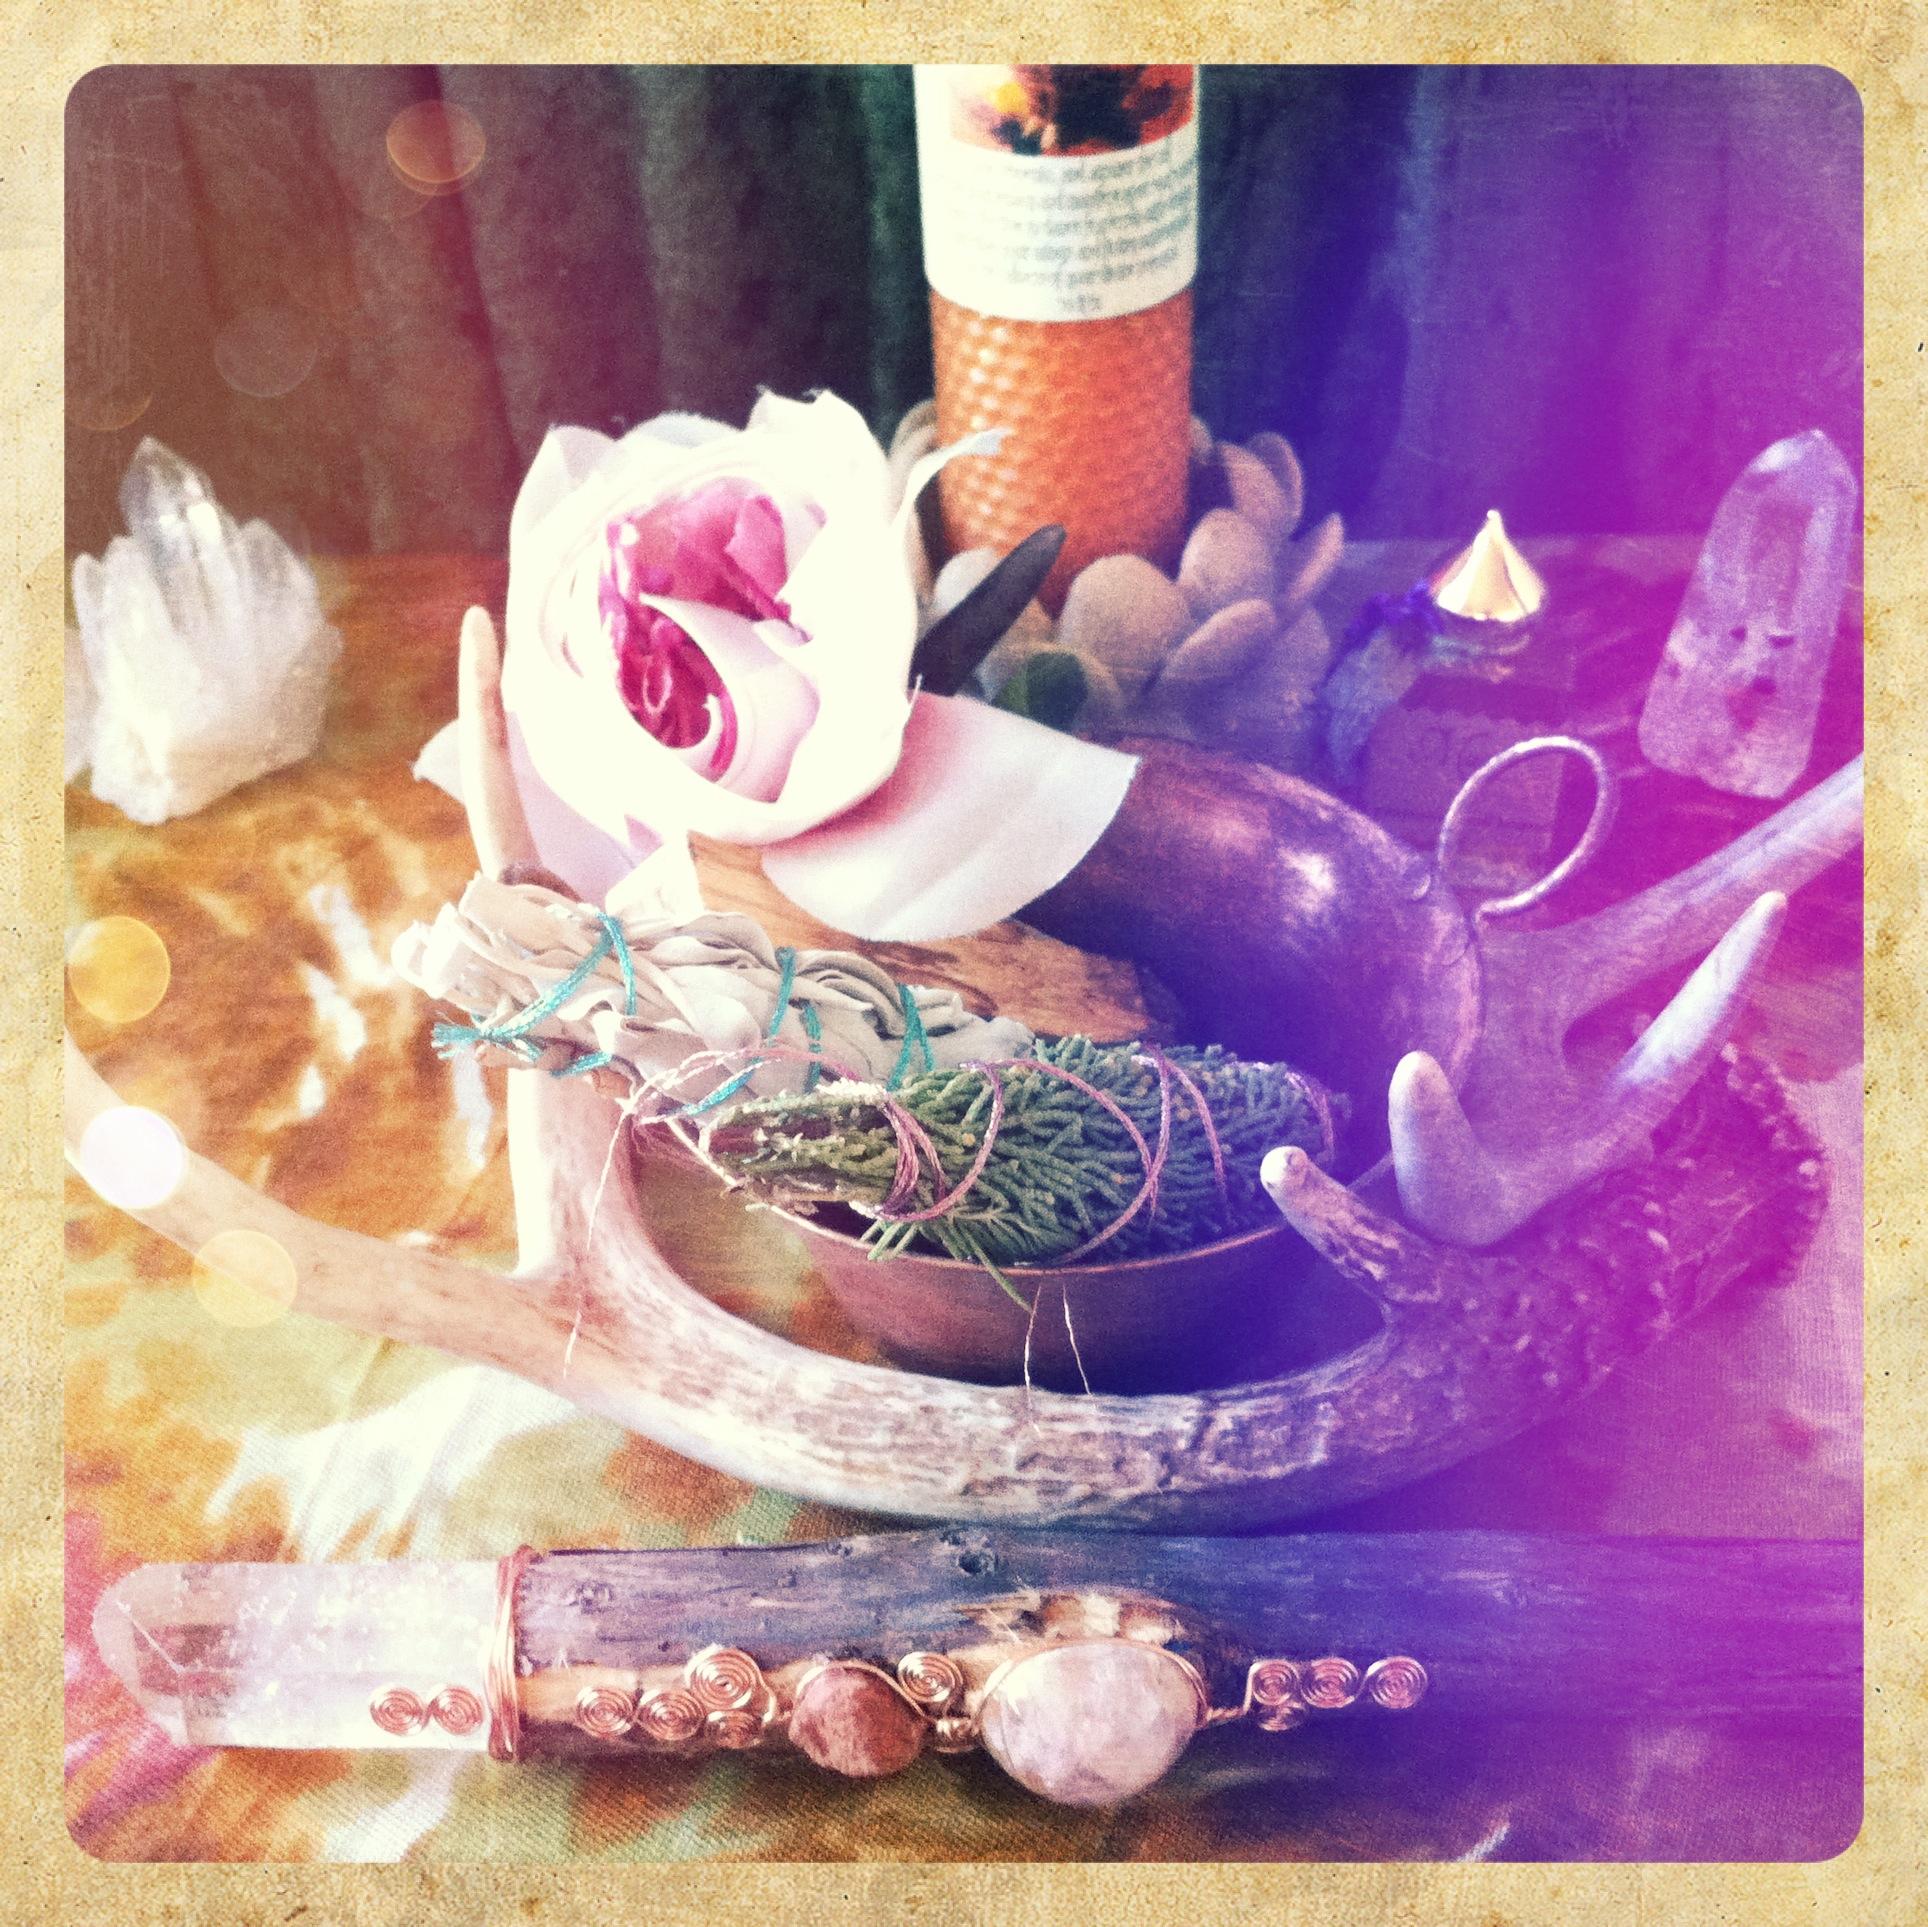 Summoning your ancient wisdom